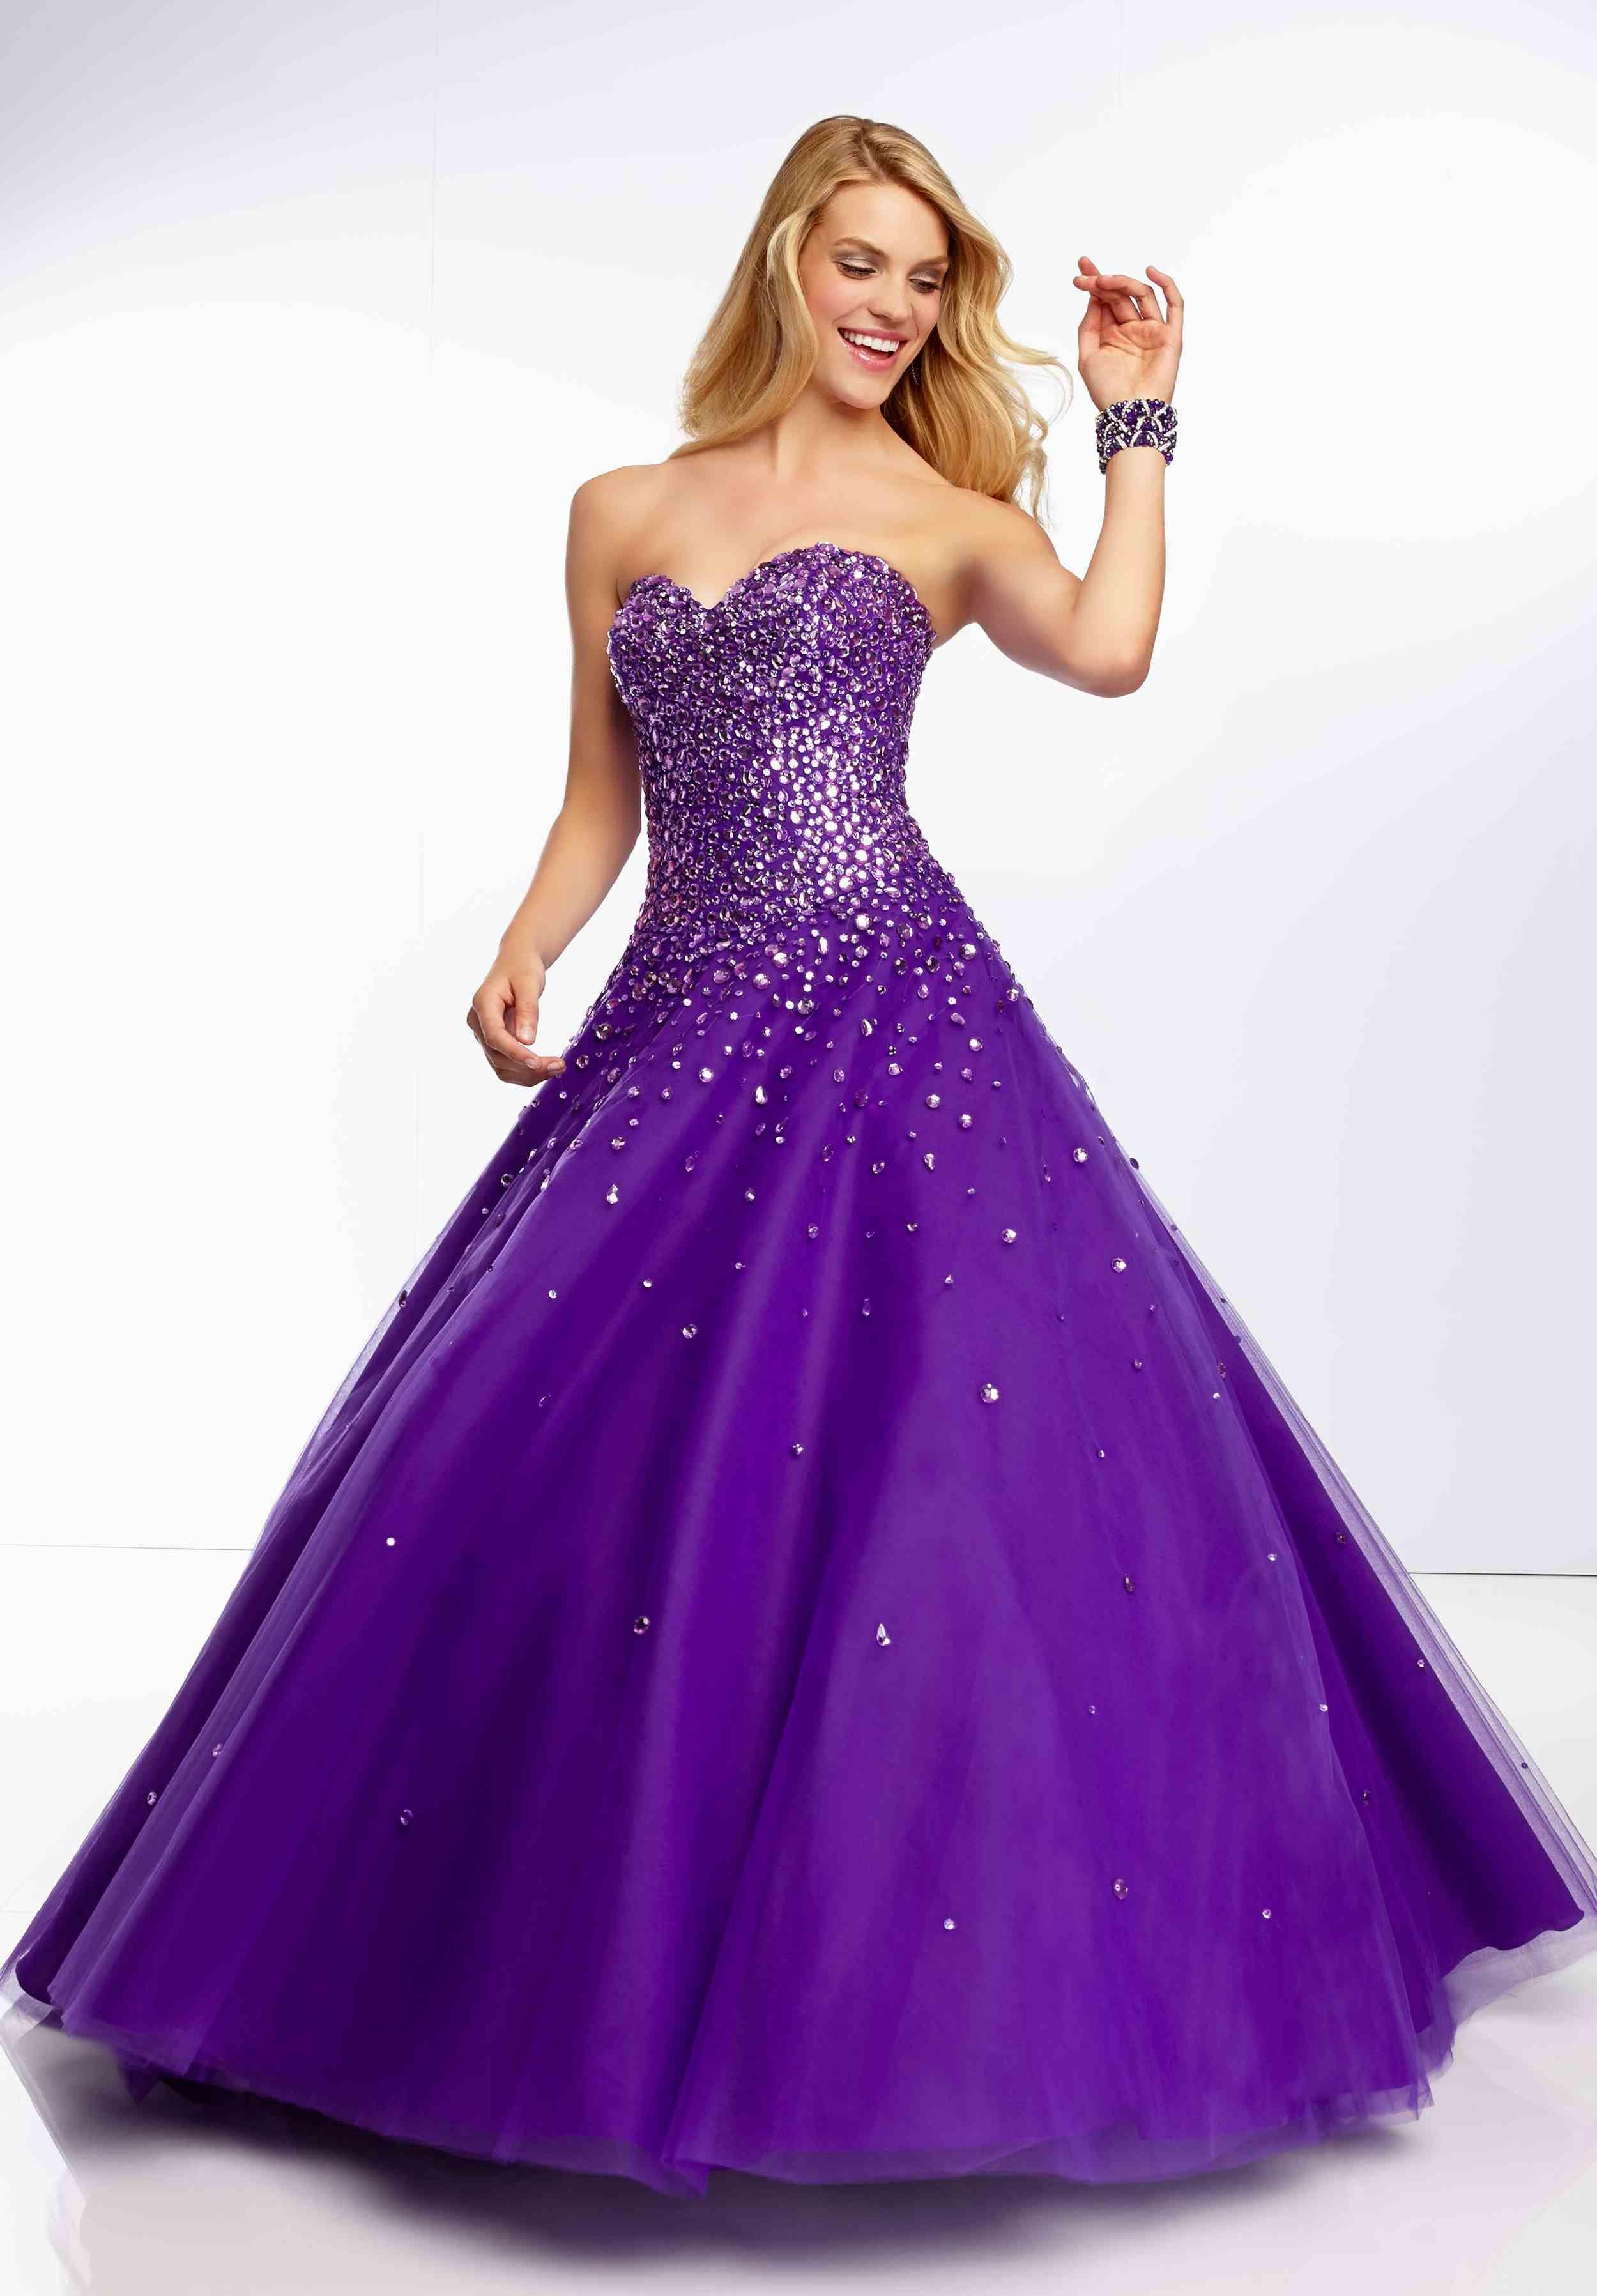 Morilee Prom Dresses Ball Dresses Ball Gown Dresses Prom Dresses [ 3594 x 2500 Pixel ]